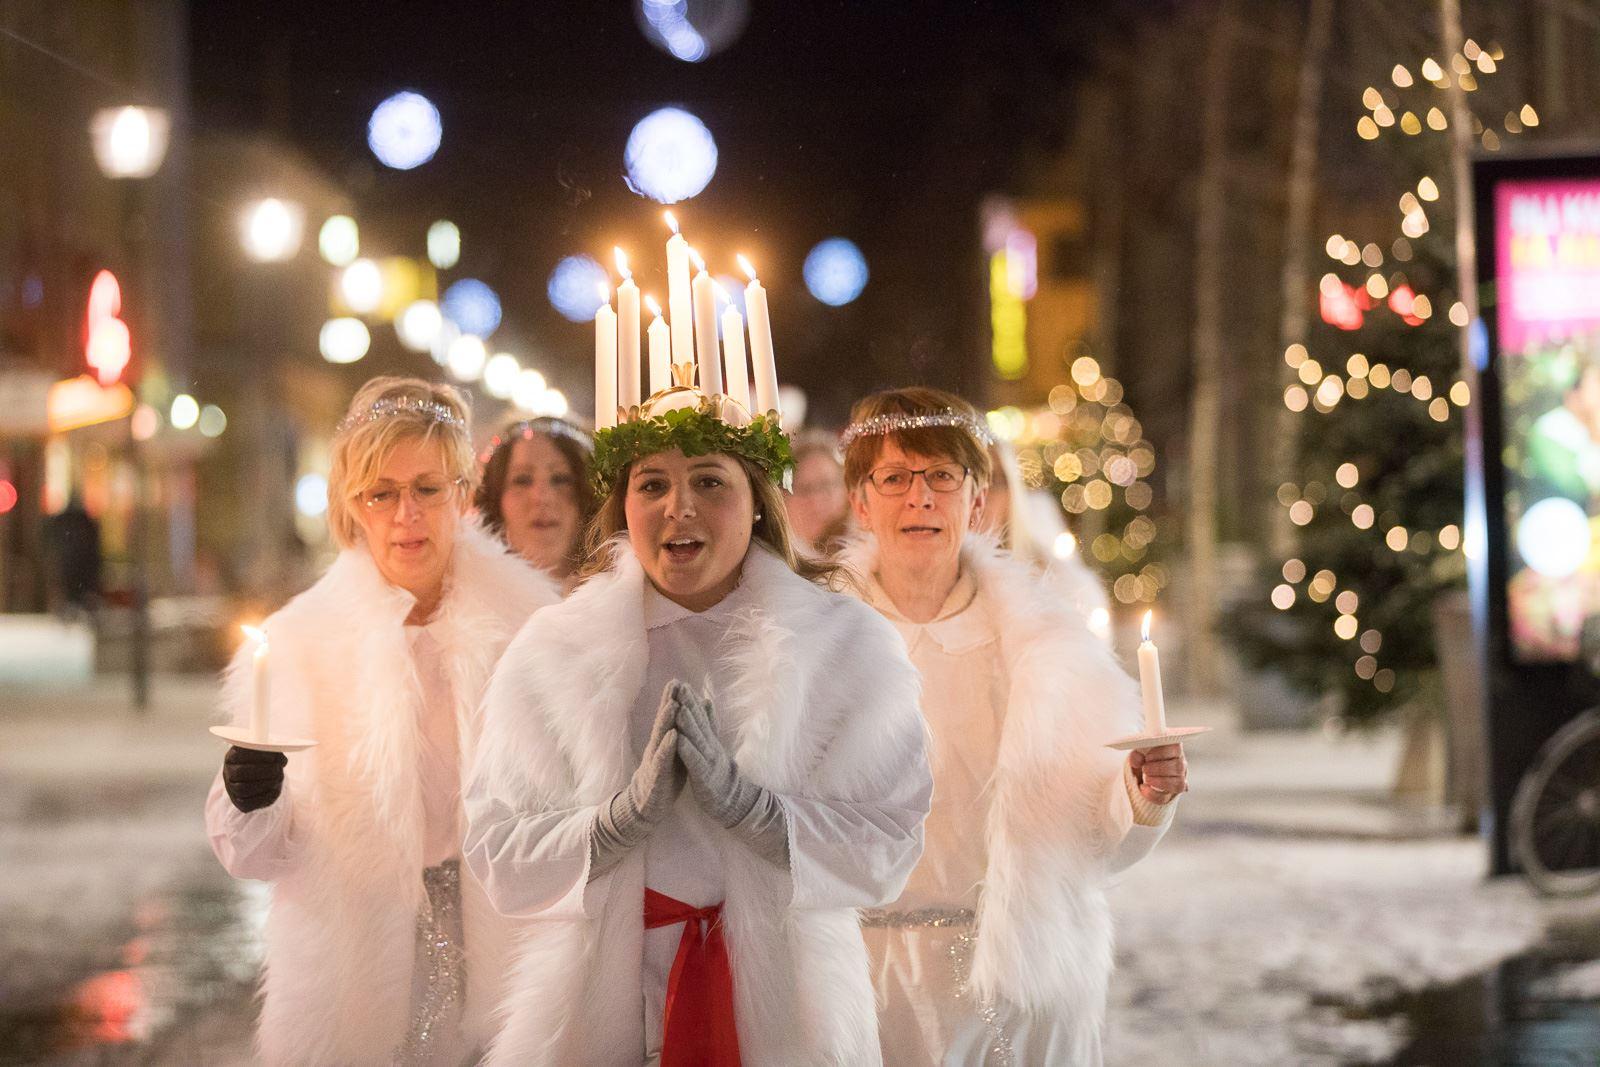 Umeå center Saint Lucy choir K2